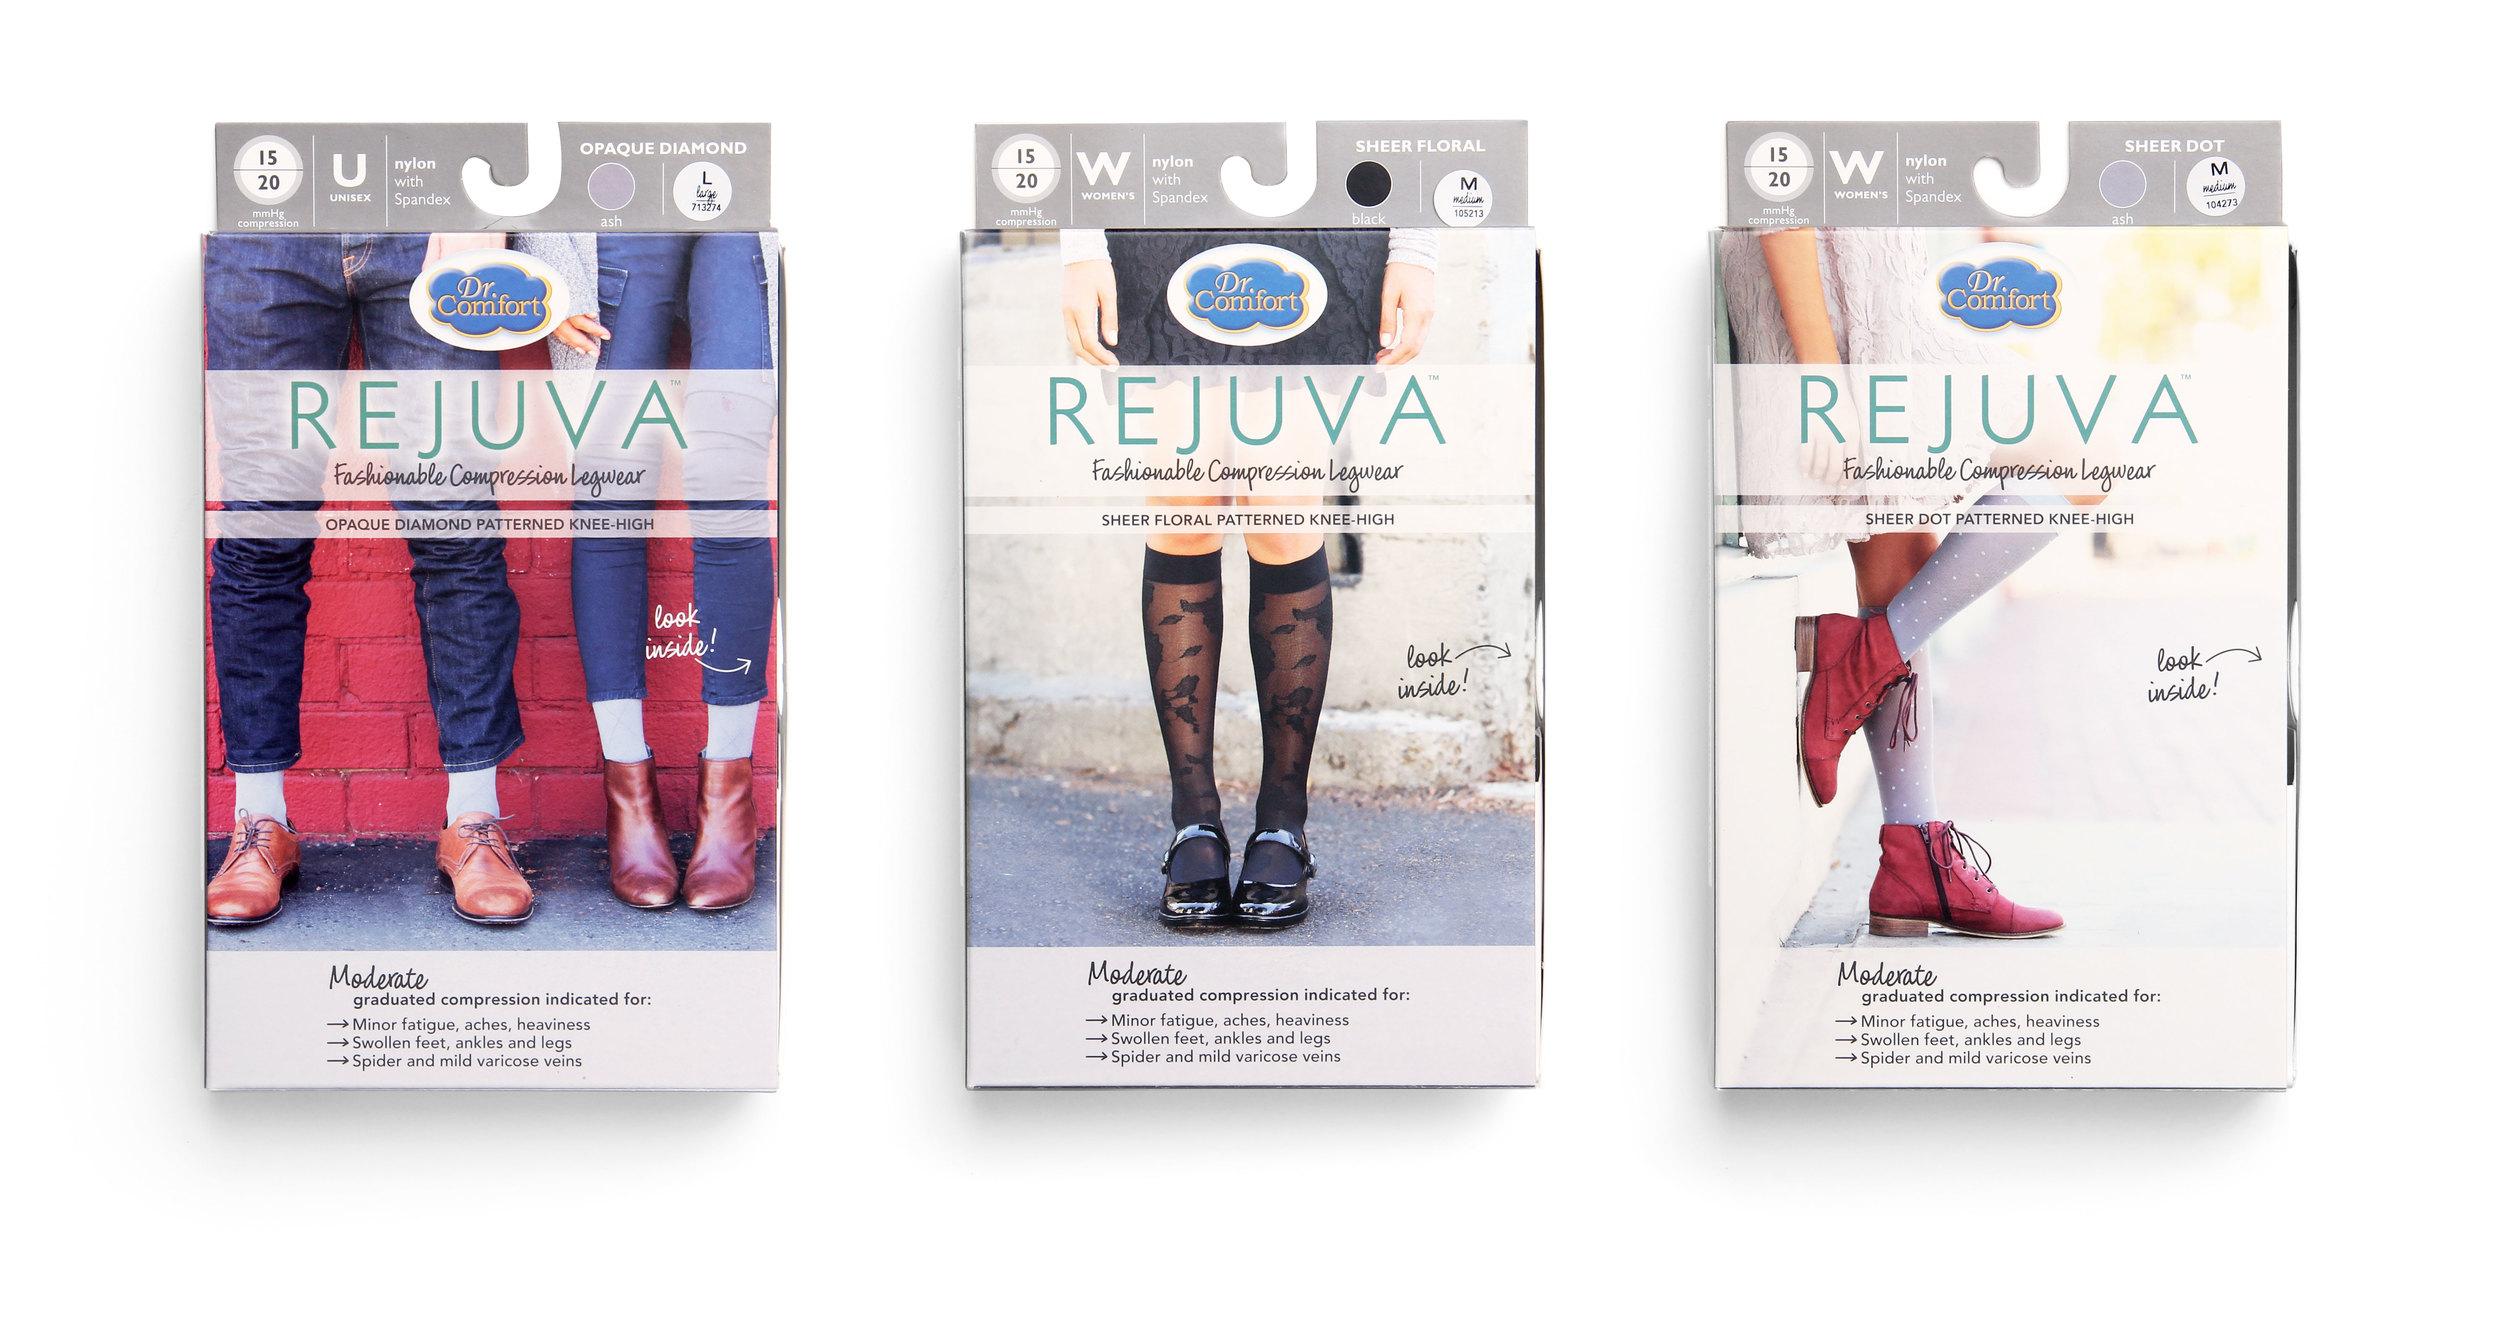 rejuva-line-up